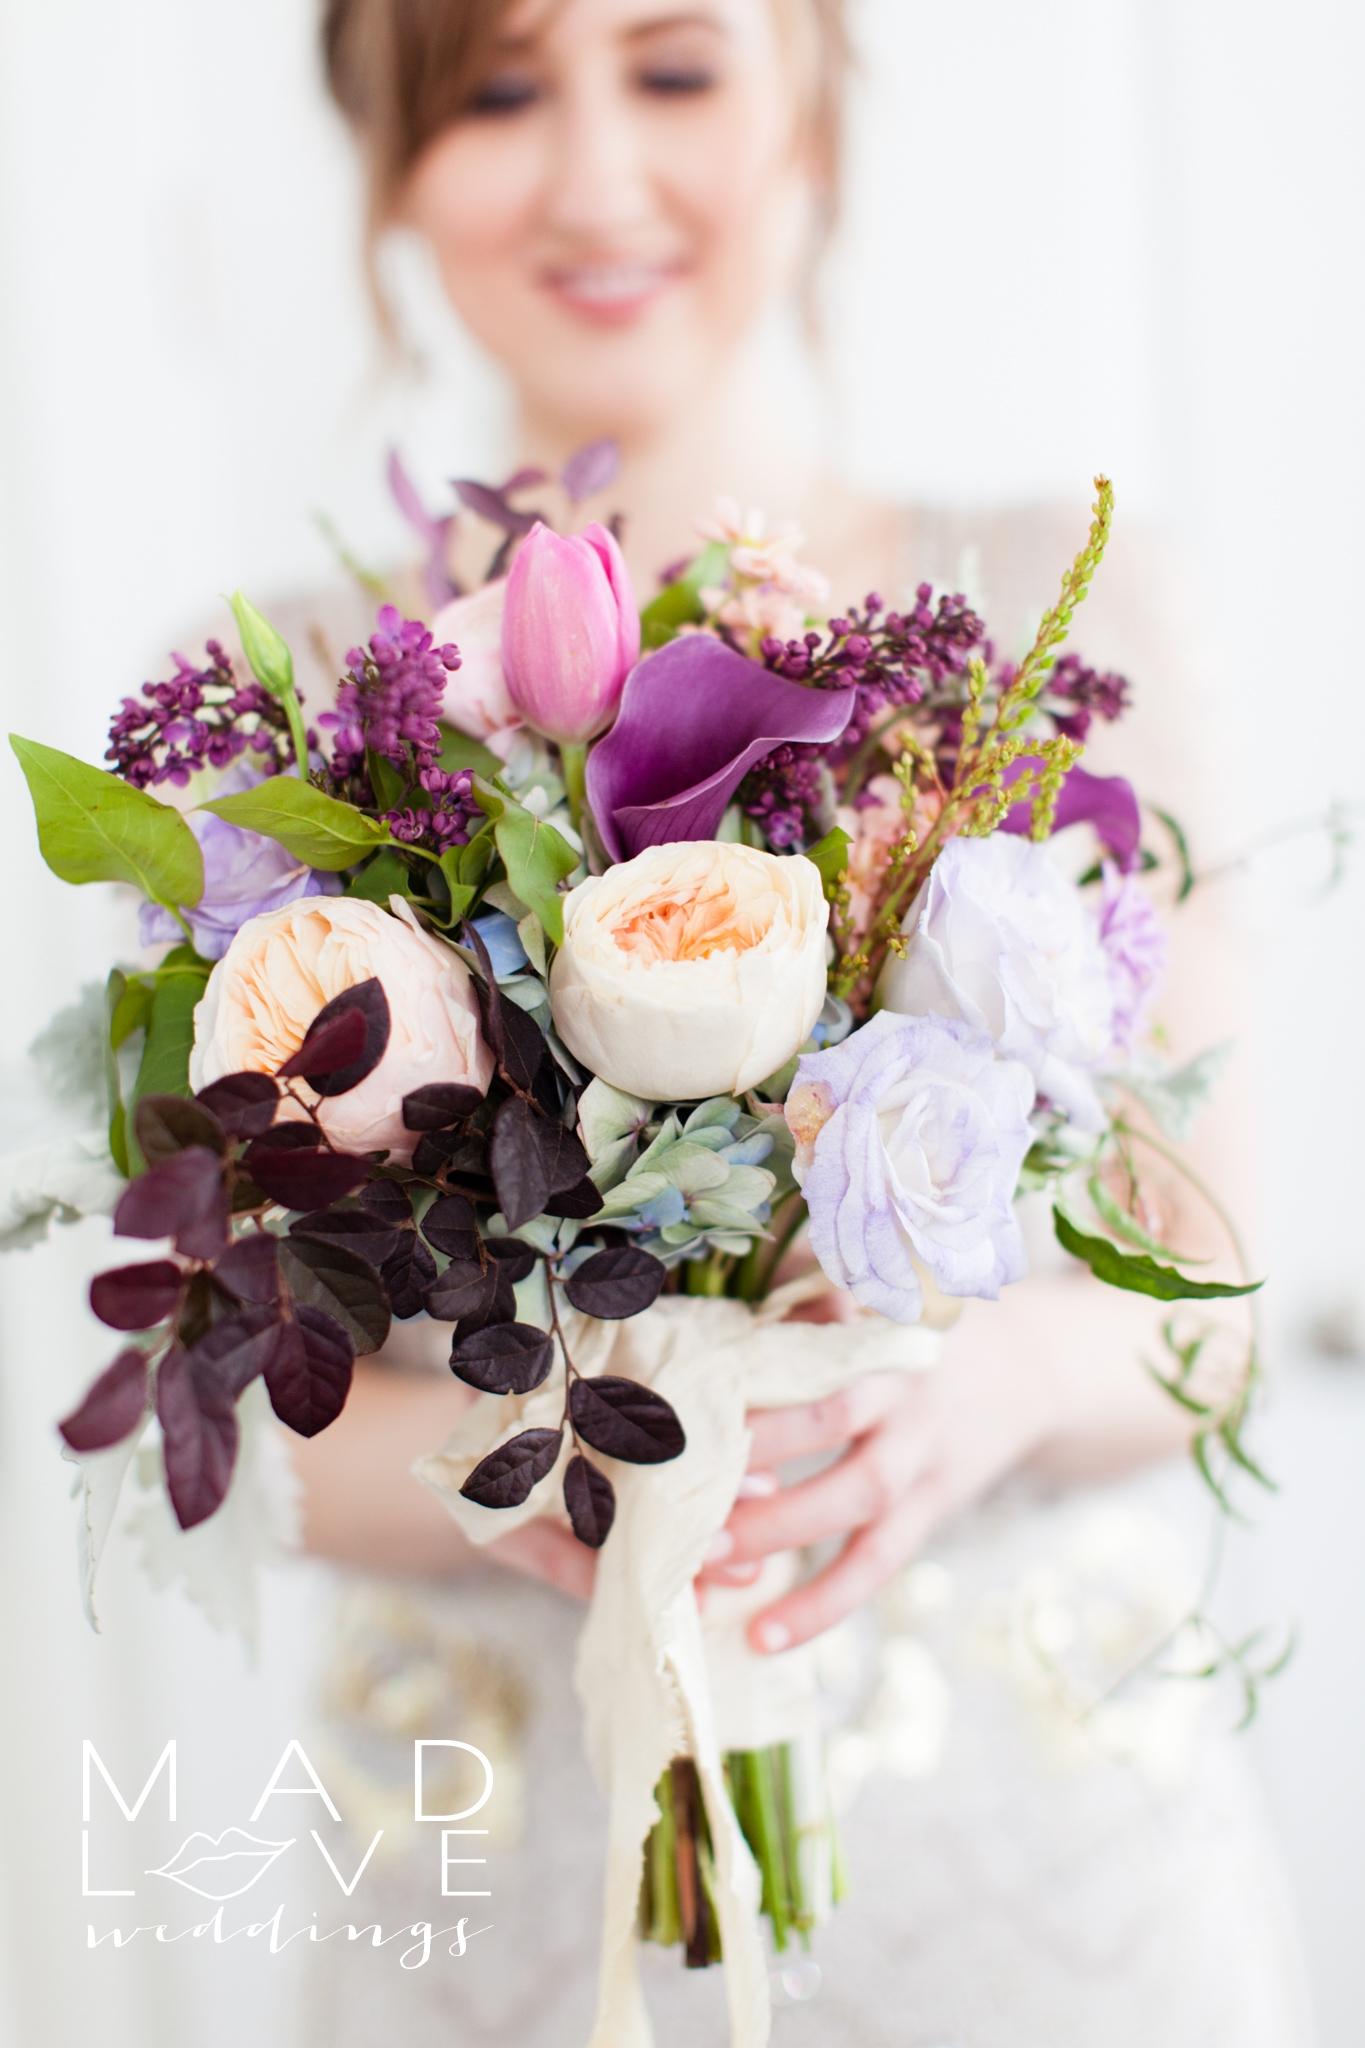 Fran & Jason- Mad Love Weddings-FB-20.jpg